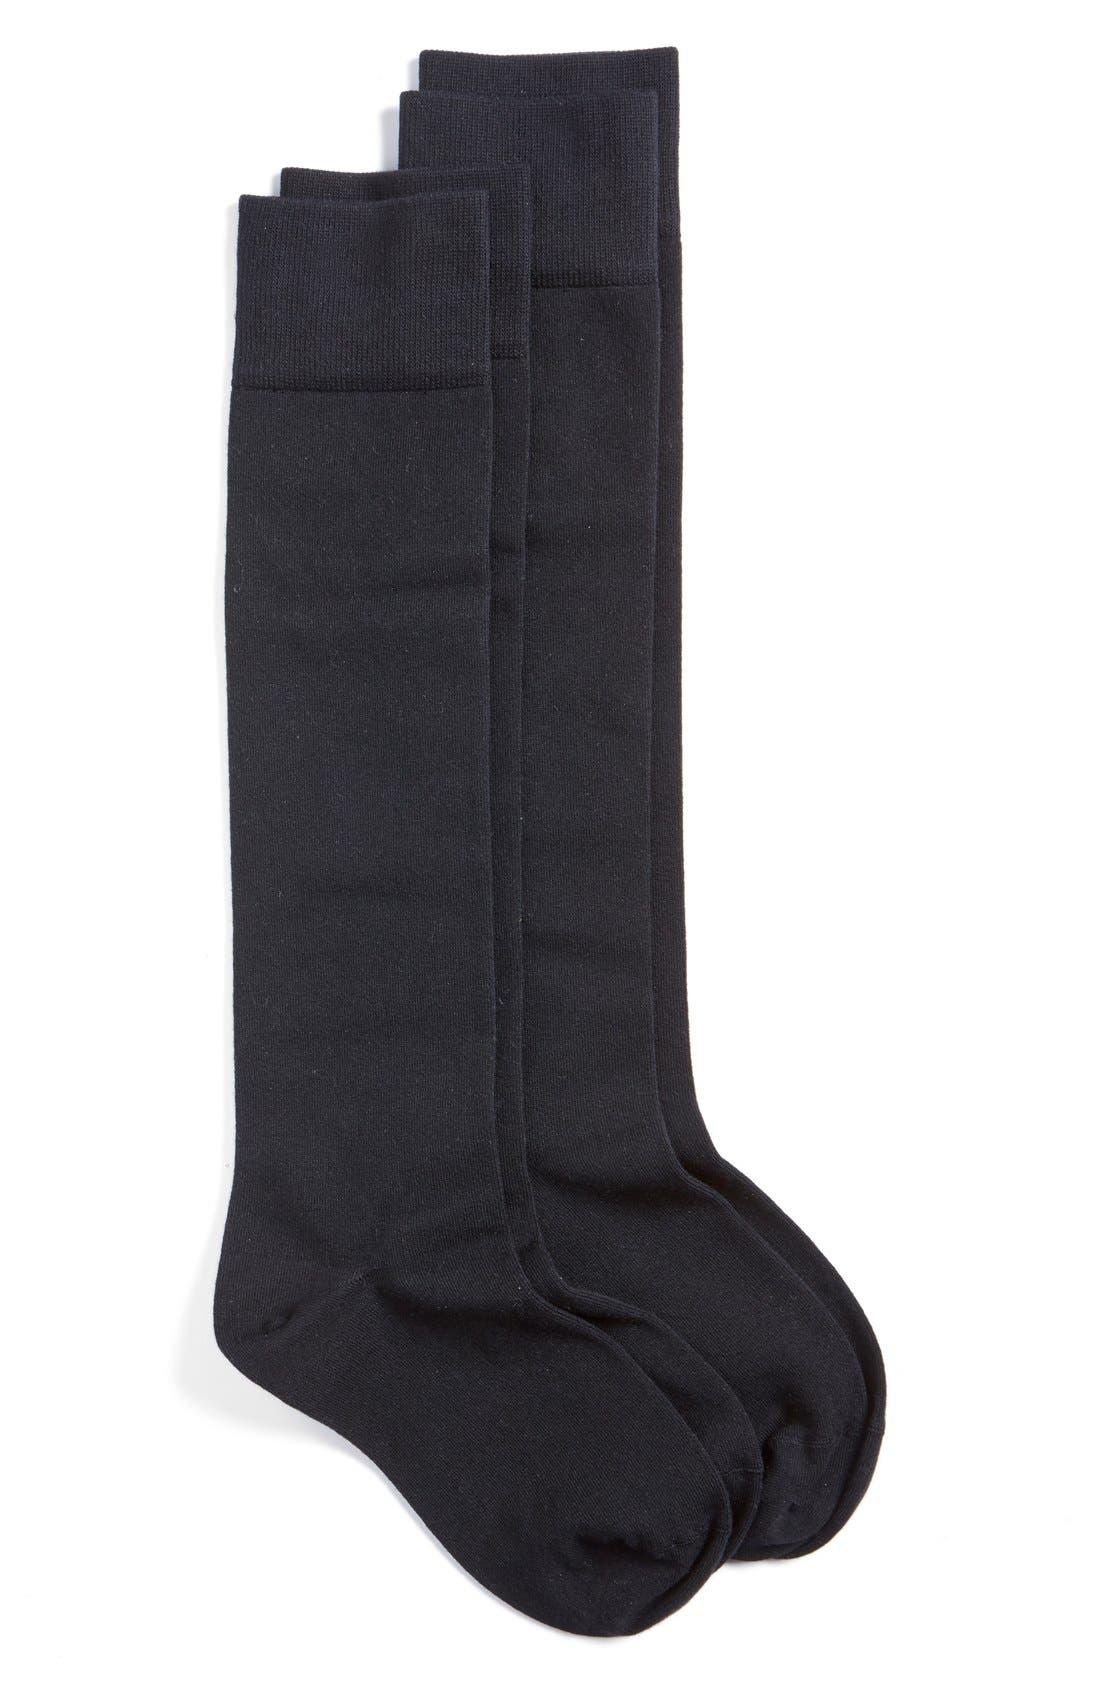 2-Pack Knee High Socks,                         Main,                         color, Black